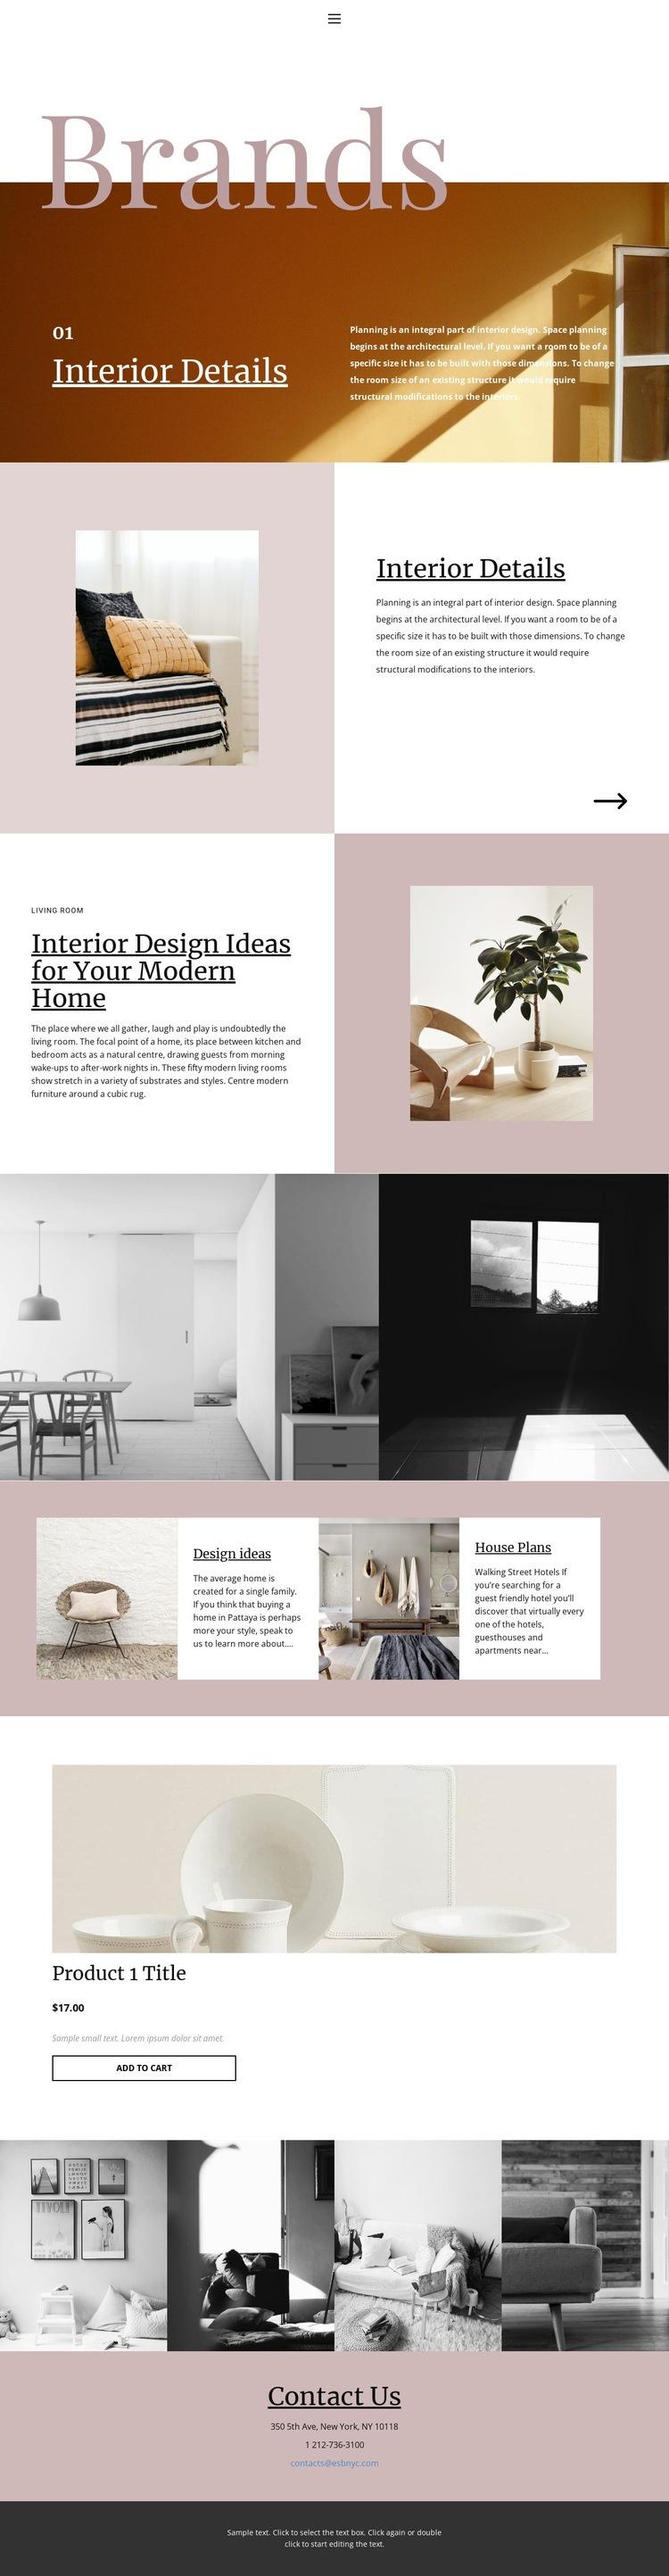 I am an interior designer Html Code Example